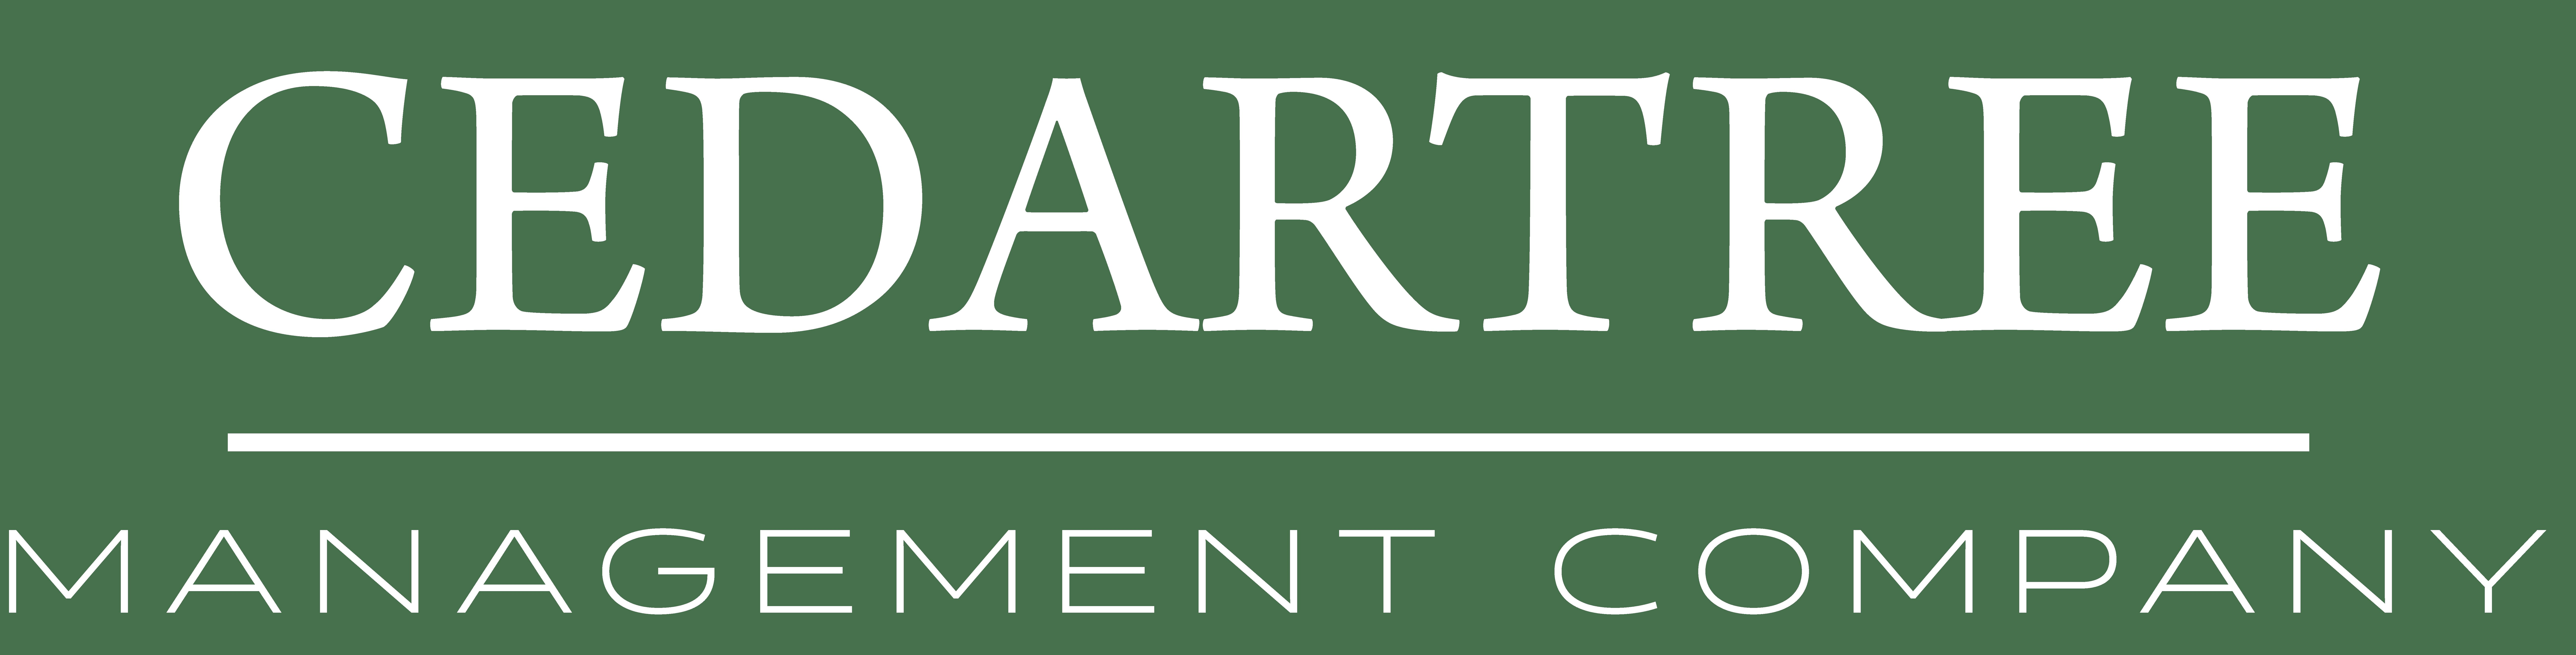 Cedartree Management Company